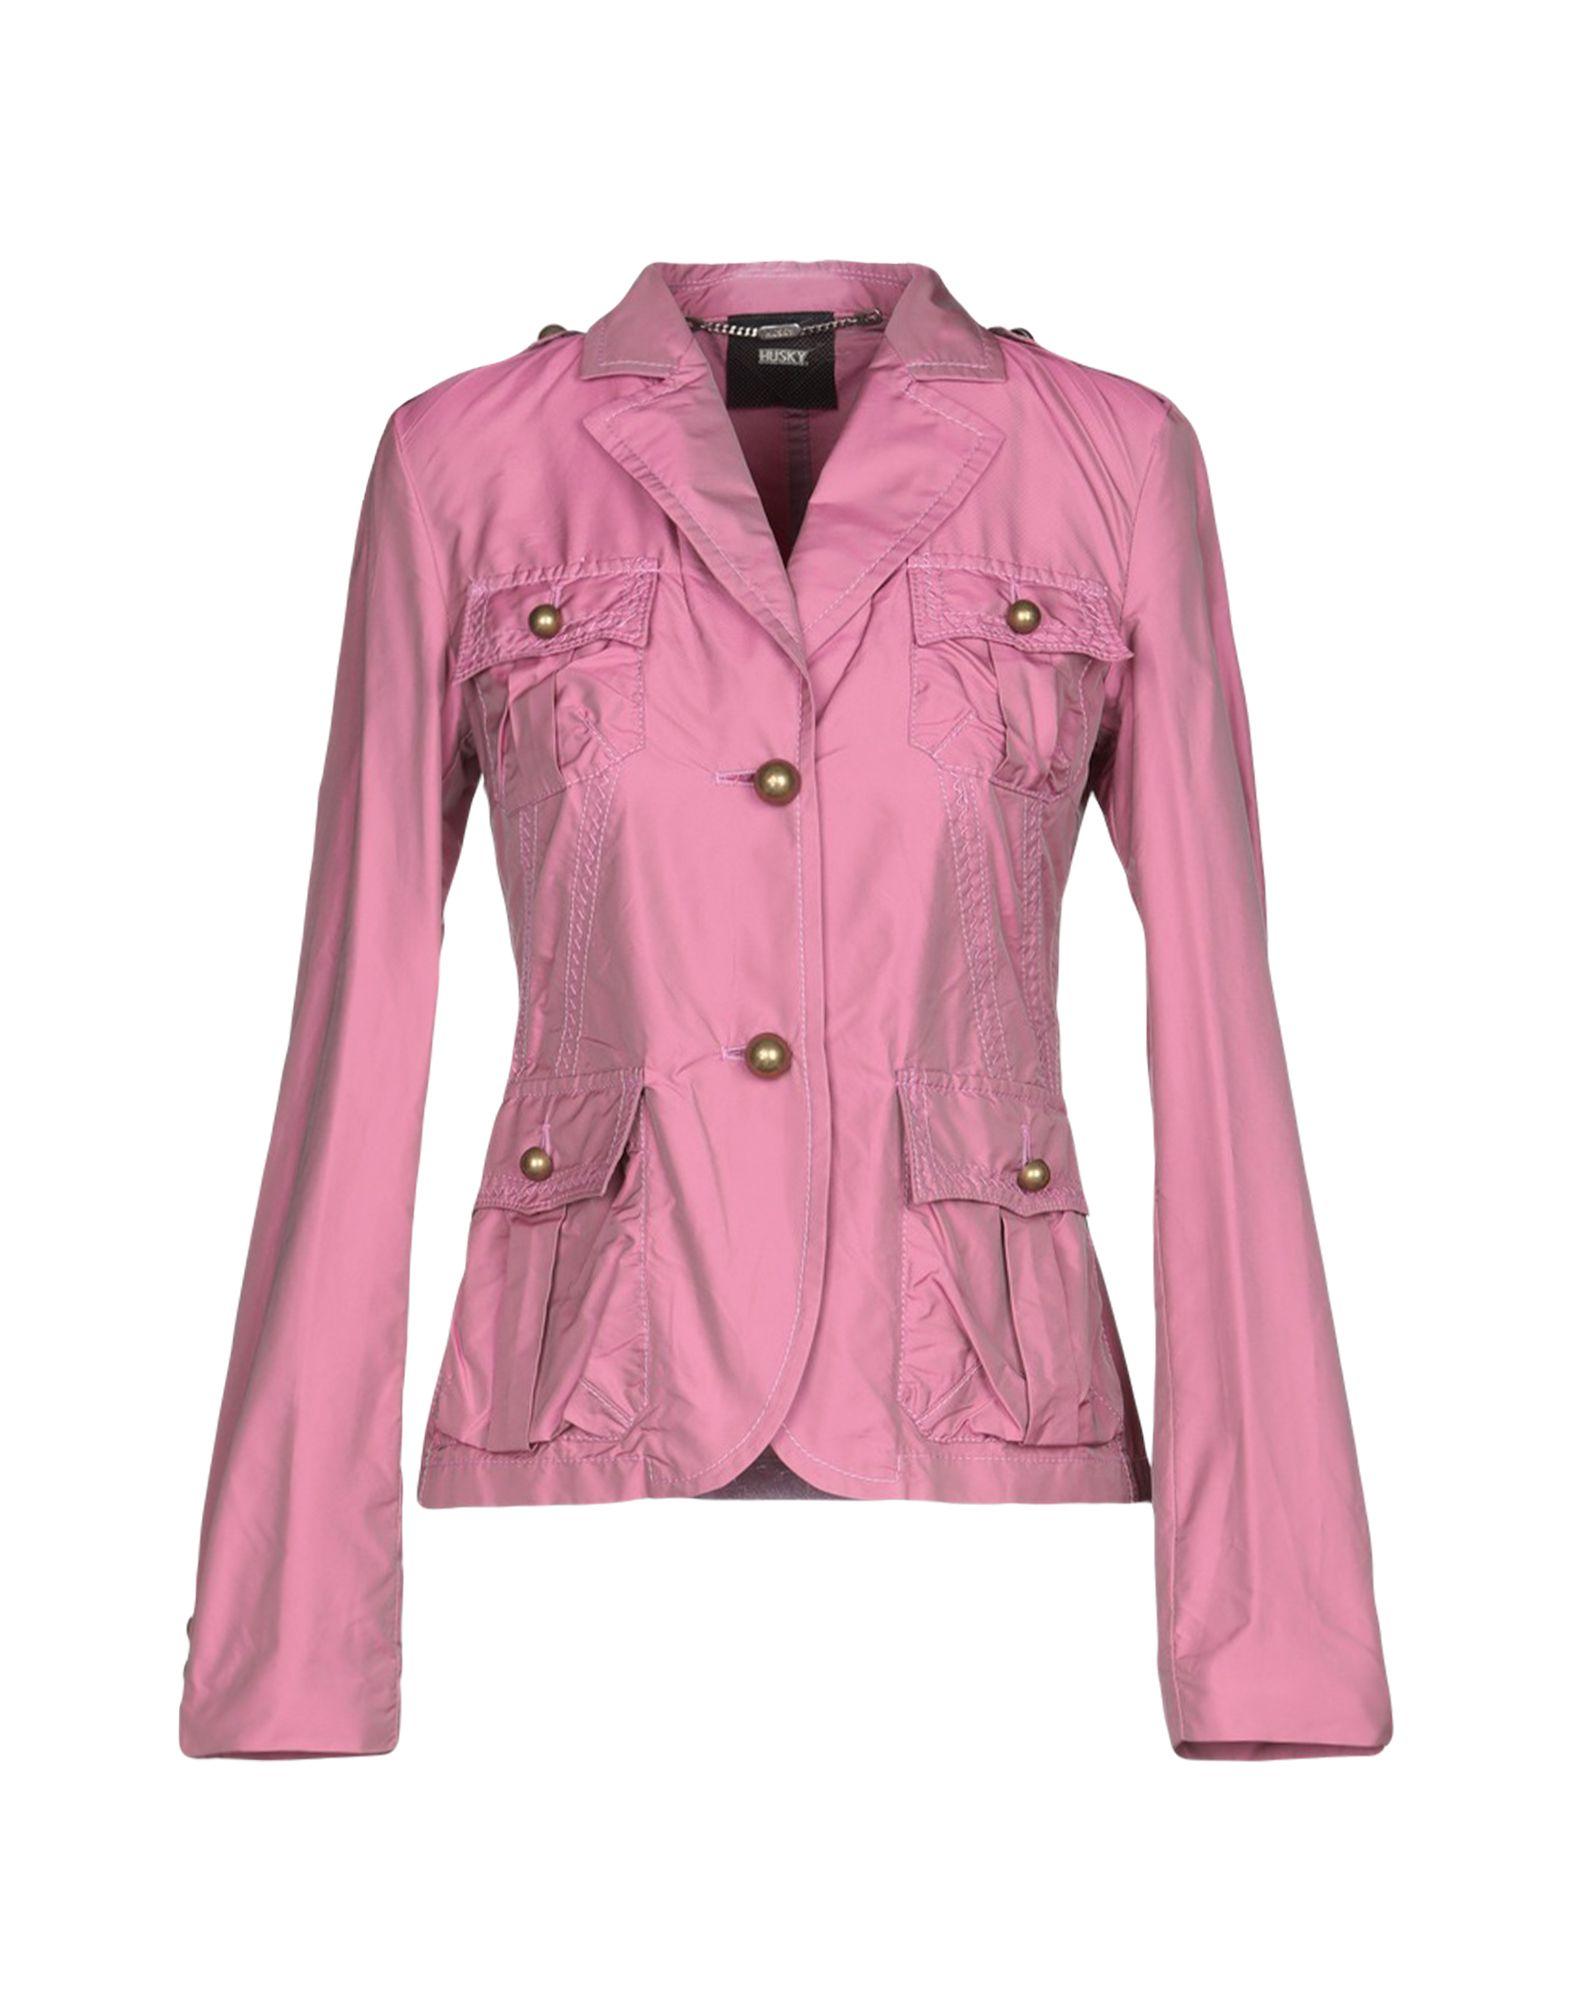 HUSKY Куртка приманка для рыбалки 2 gt gt